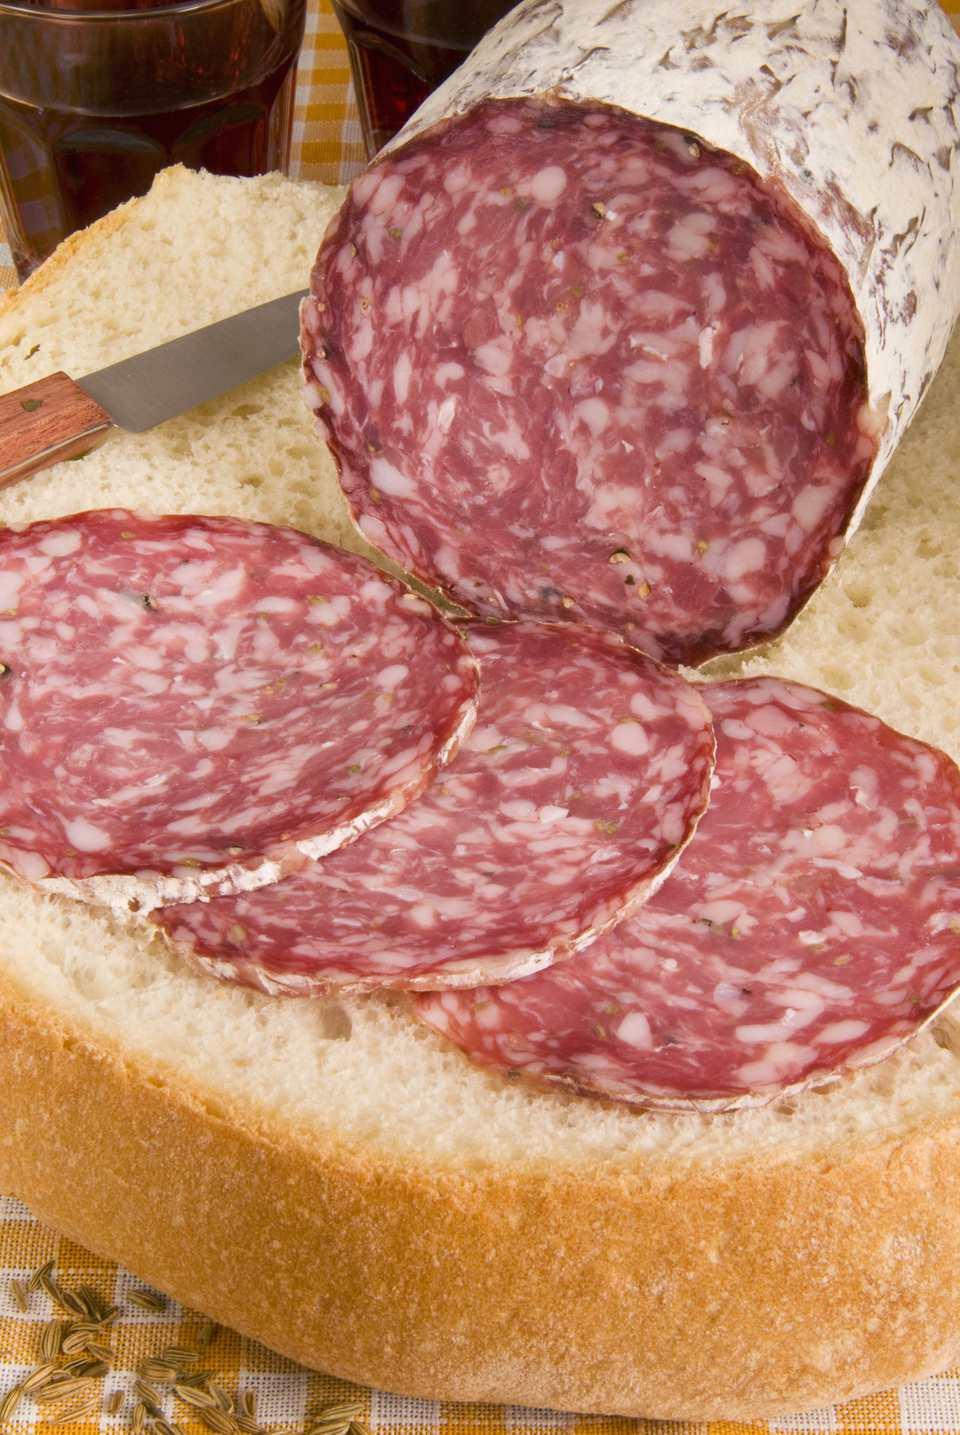 Finocchiona, Tuscan salami, with Tuscan bread